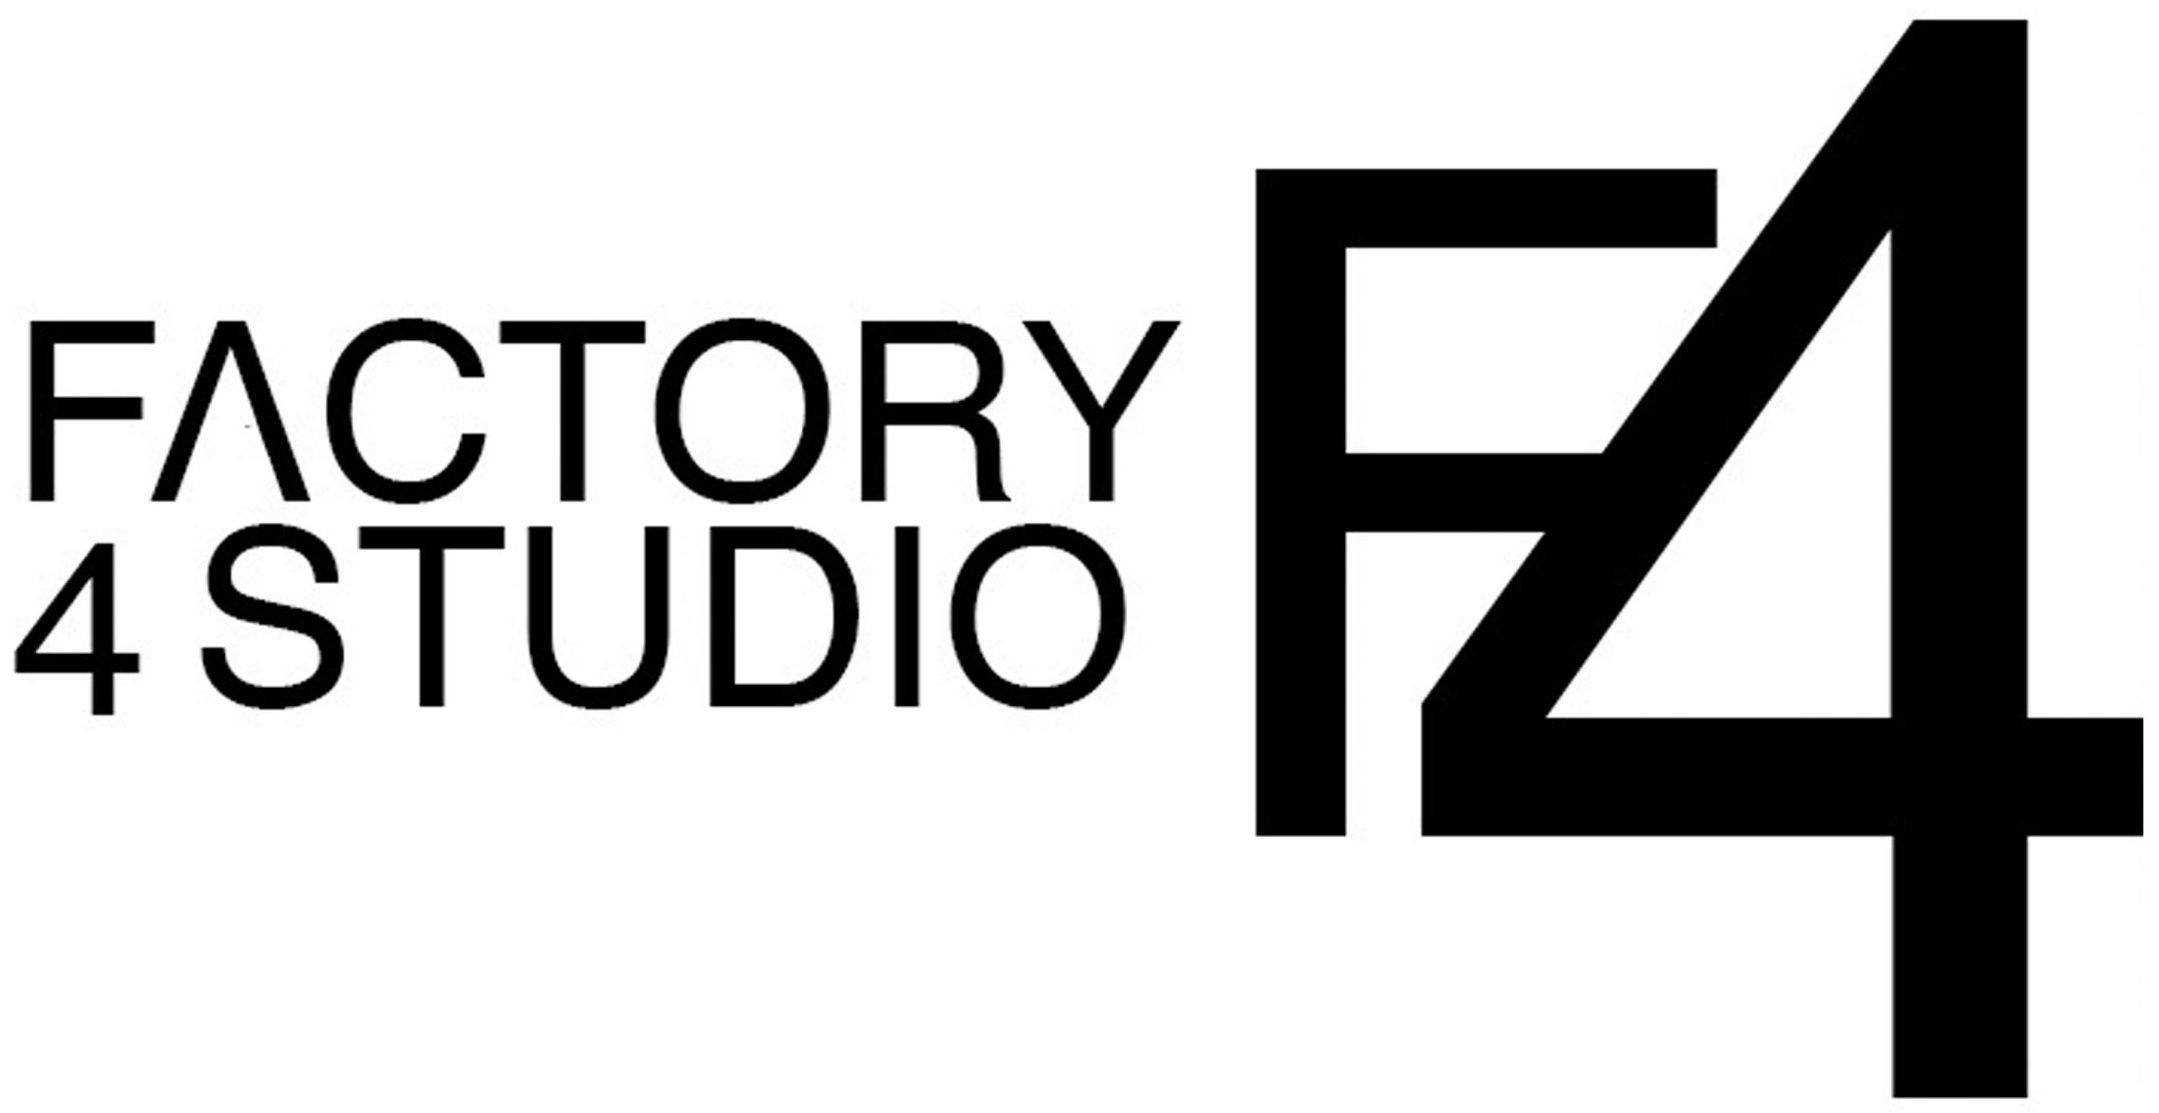 Factory 4 Studio - logo